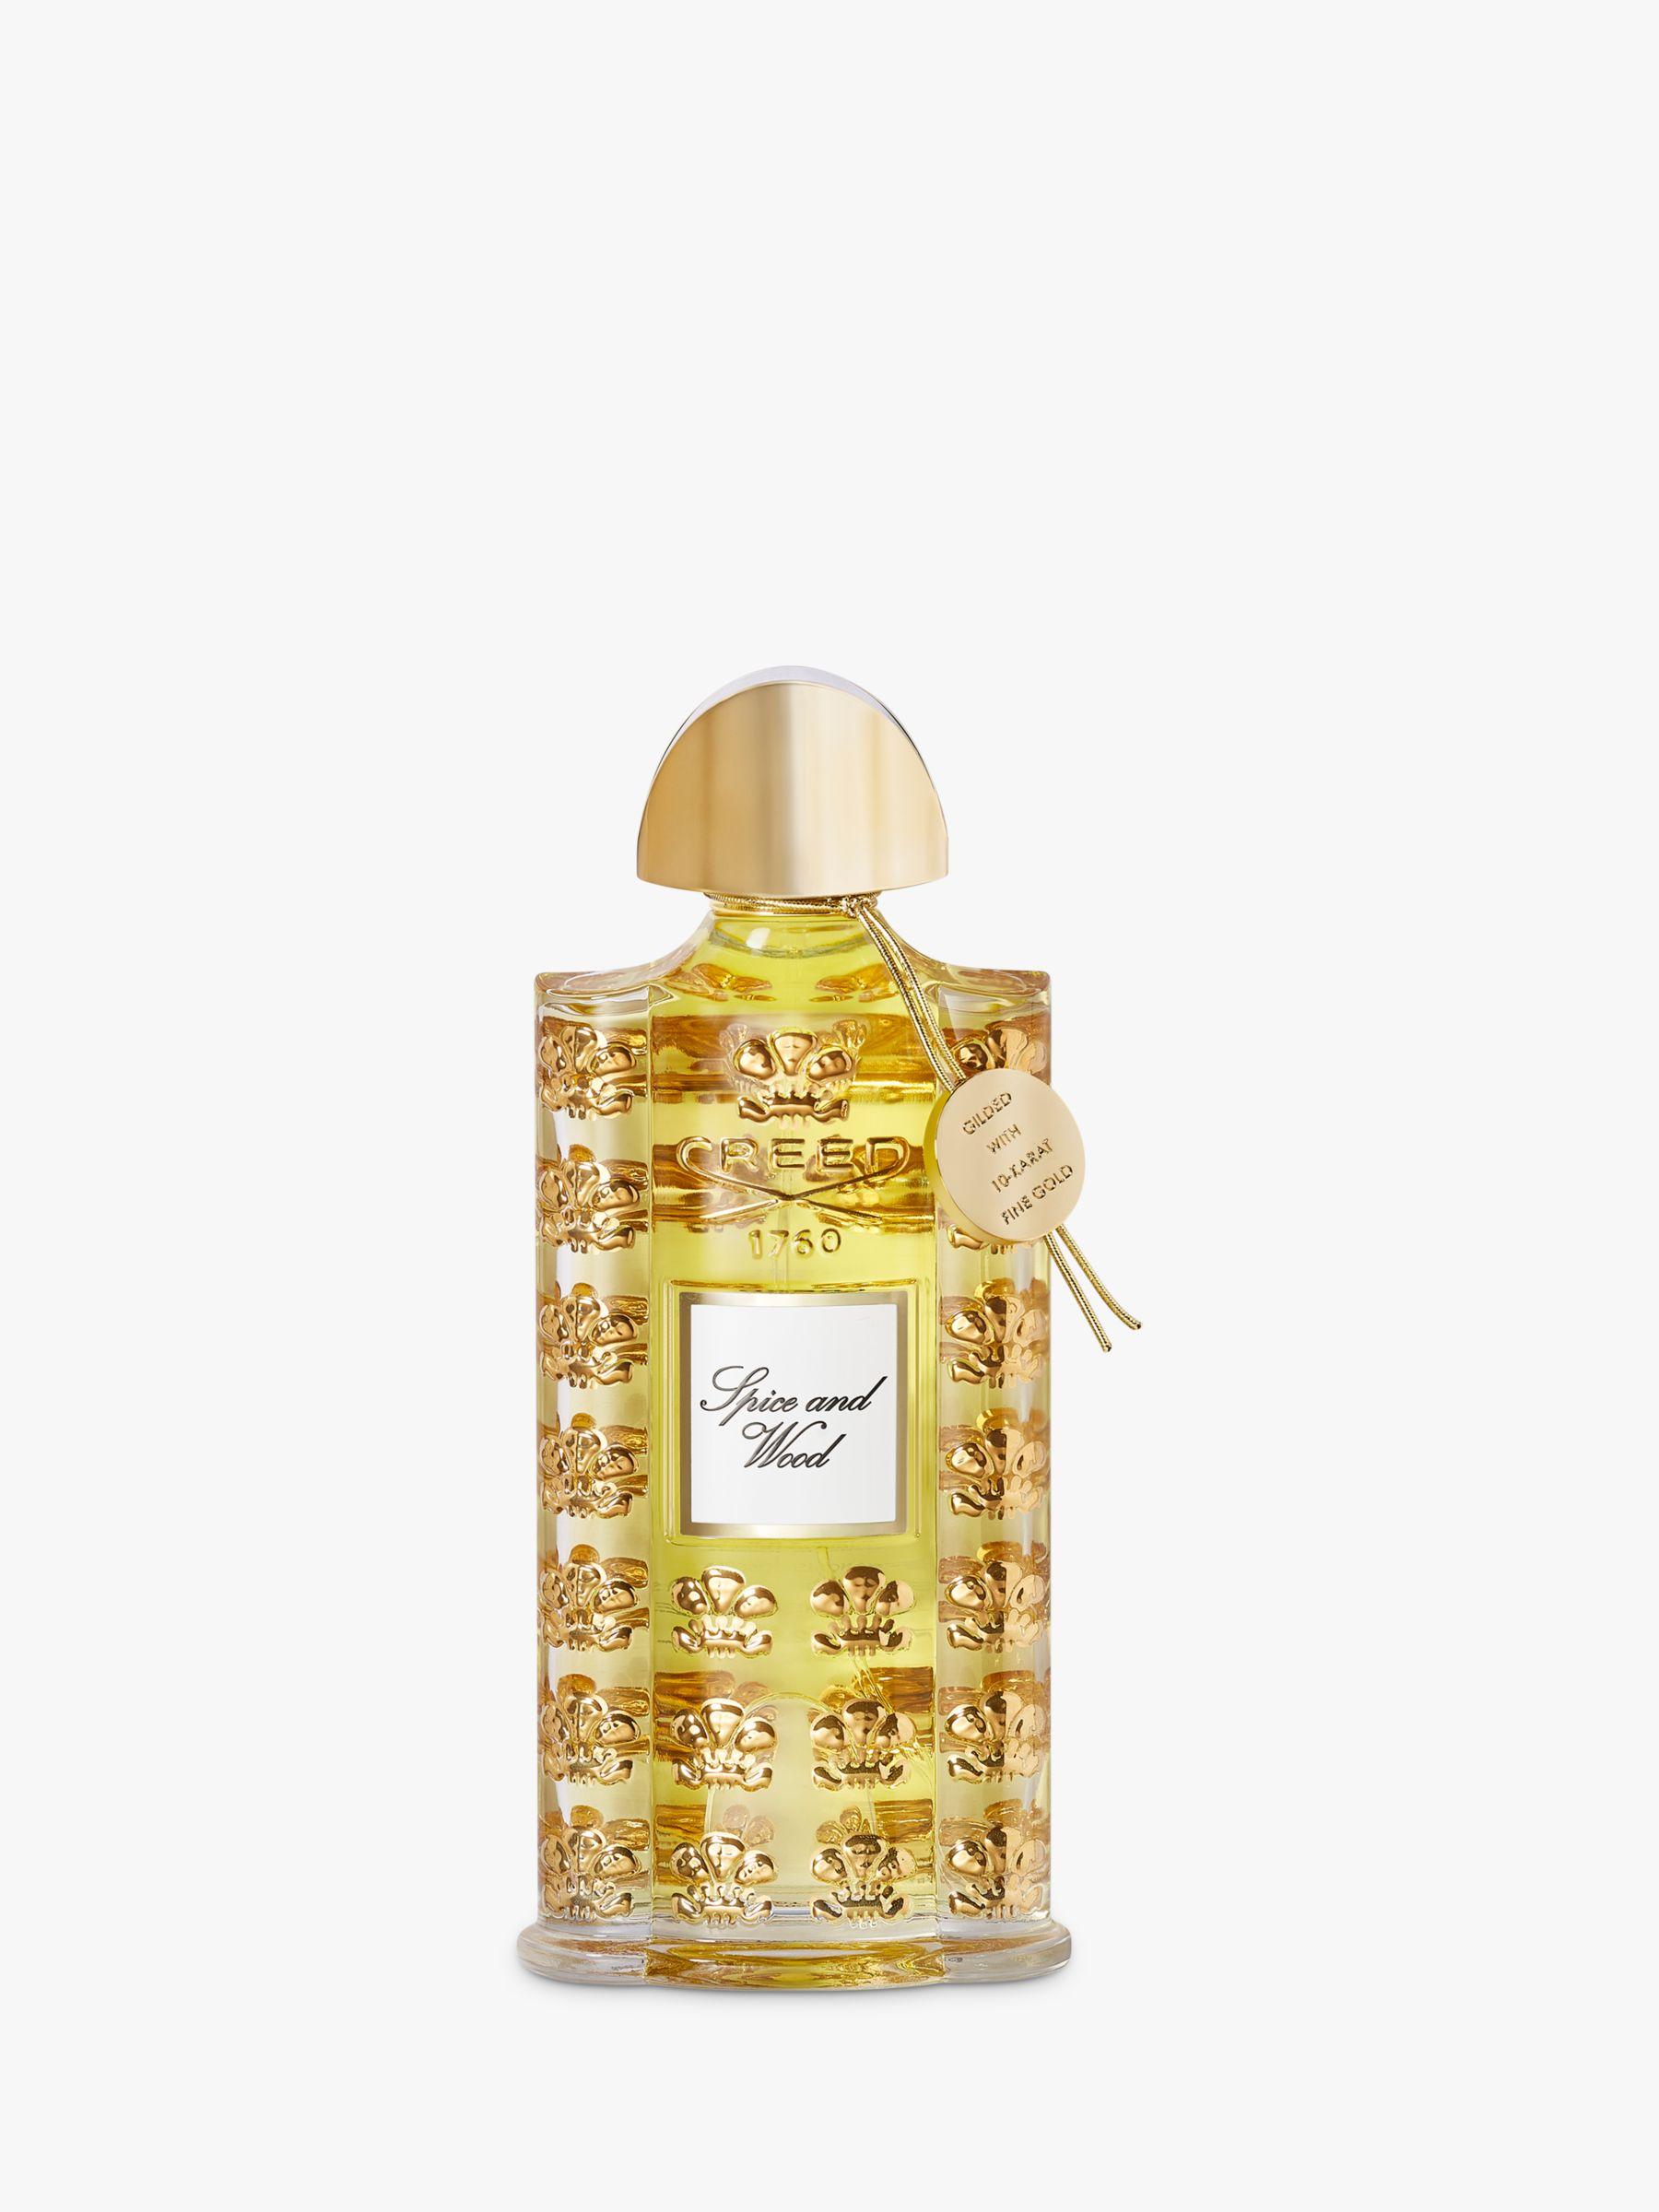 CREED Royal Exclusives Spice and Wood Eau de Parfum, 75ml